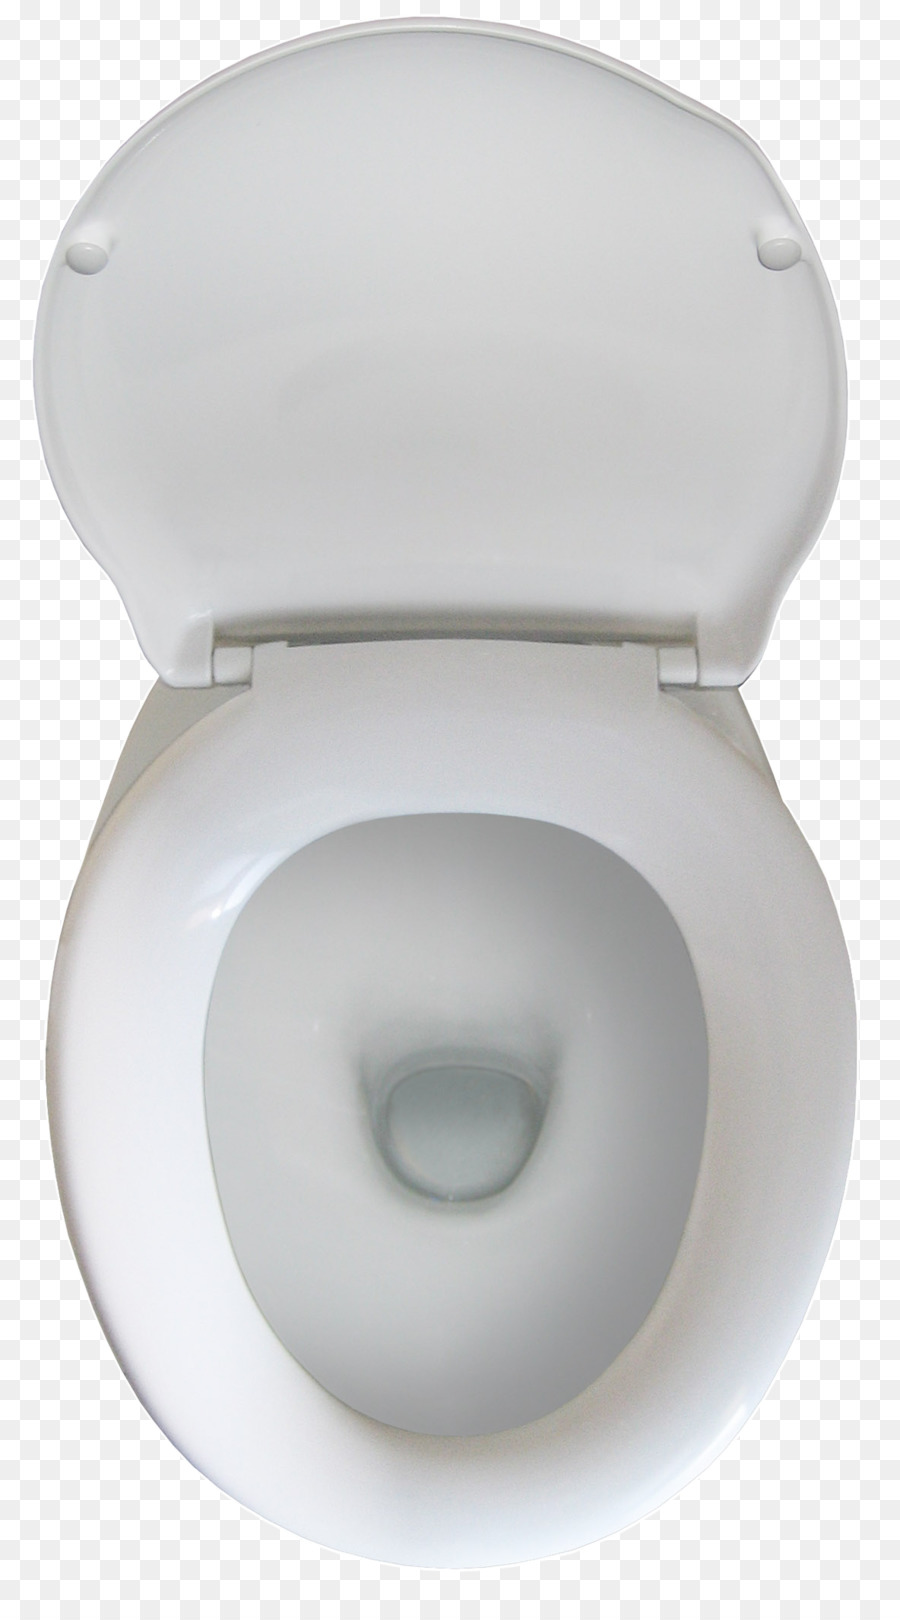 Toilet U0026 Bidet Seats Flush Toilet Bathroom Bowl   Closet